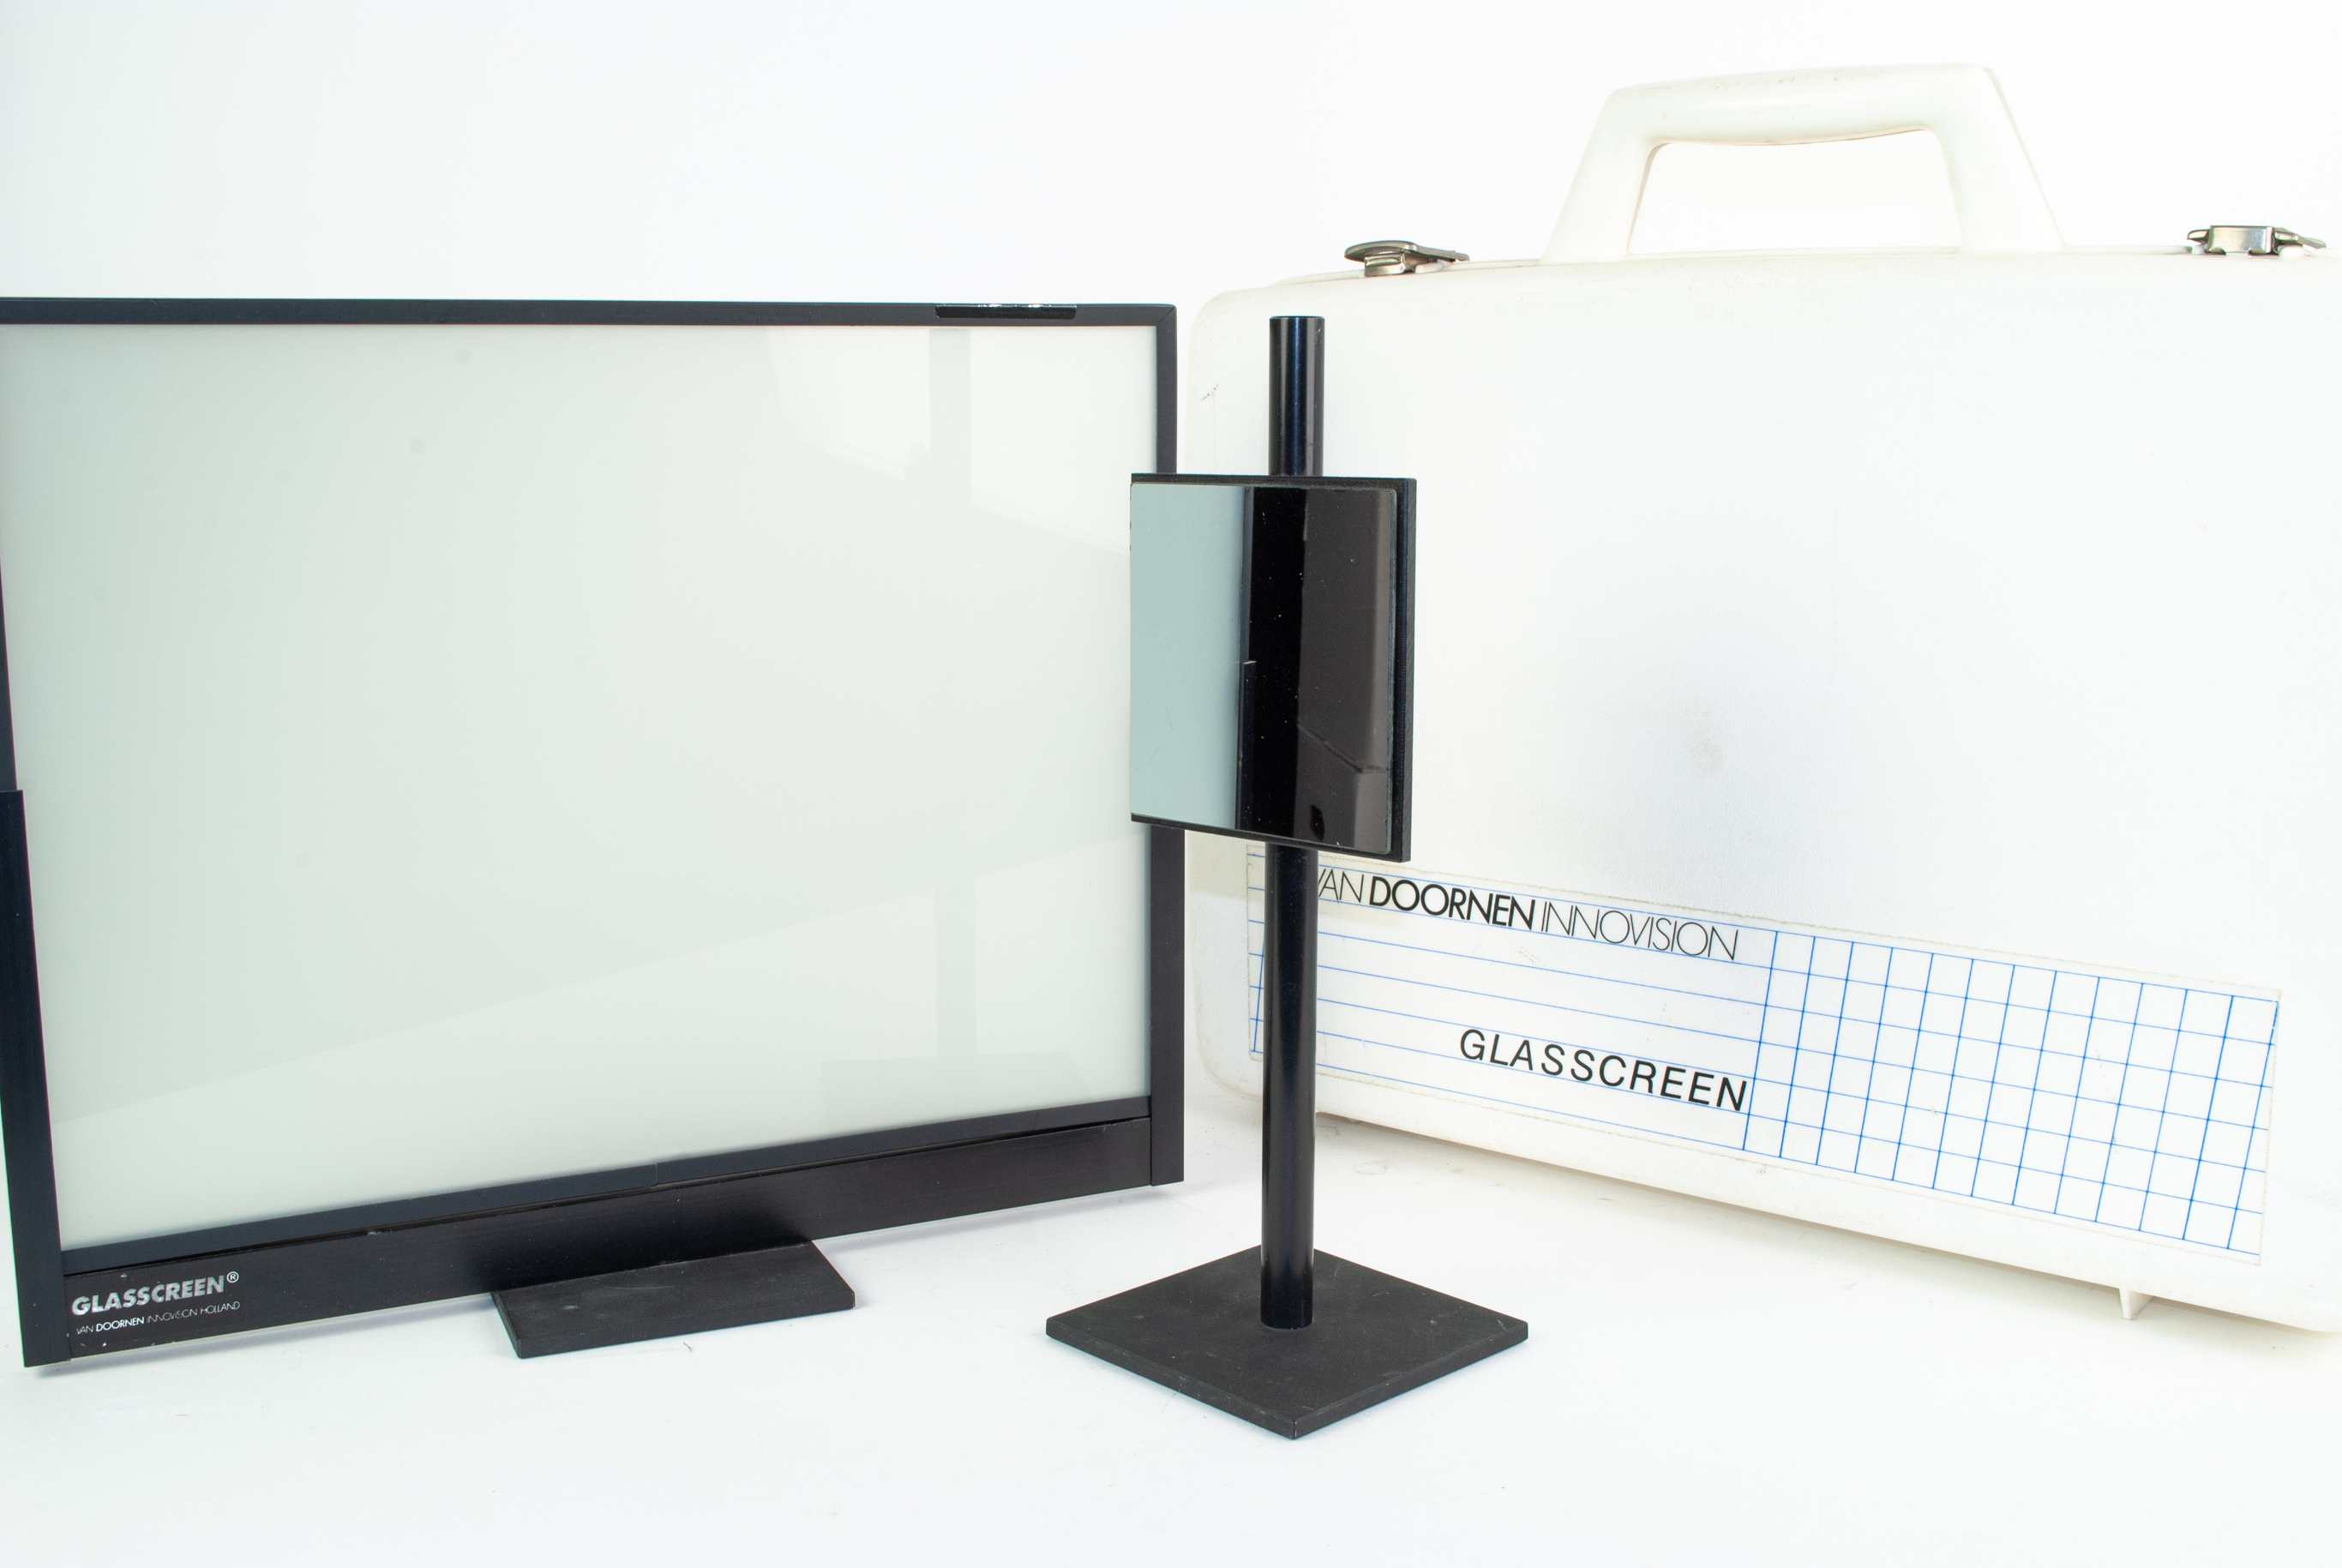 Glasscreen - PROFI set